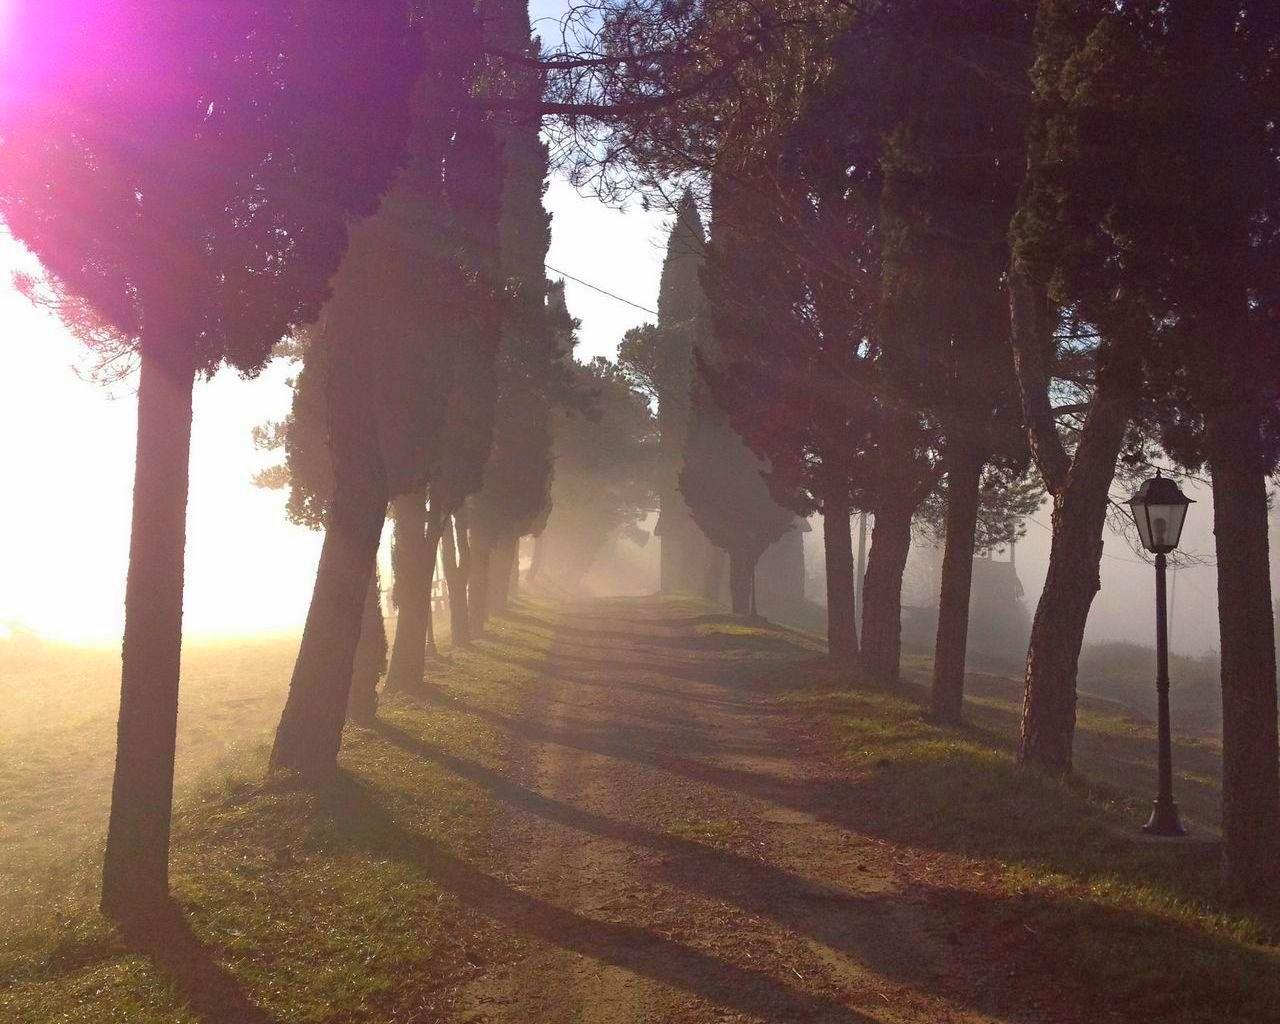 santa-felicita-paterna-turismo-umbria-agriturismo-vacanza-country-house-0-100_18